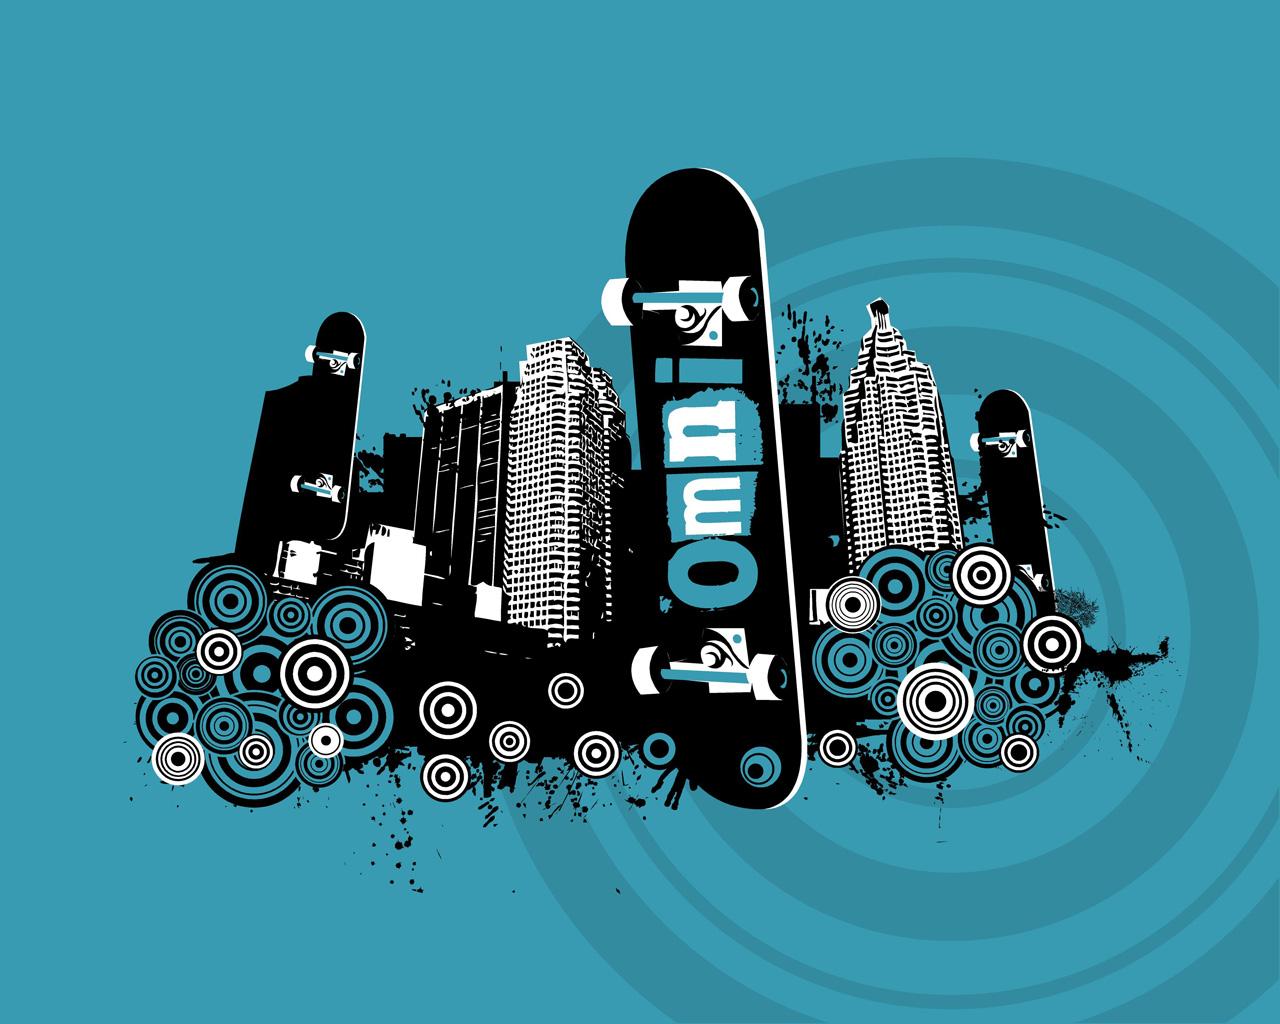 http://1.bp.blogspot.com/_8Qs8yAbSMsI/TVQoExui4KI/AAAAAAAAAAY/9wM6Avqfgj0/s1600/Skate_Wallpaper_by_kasovitz.jpg